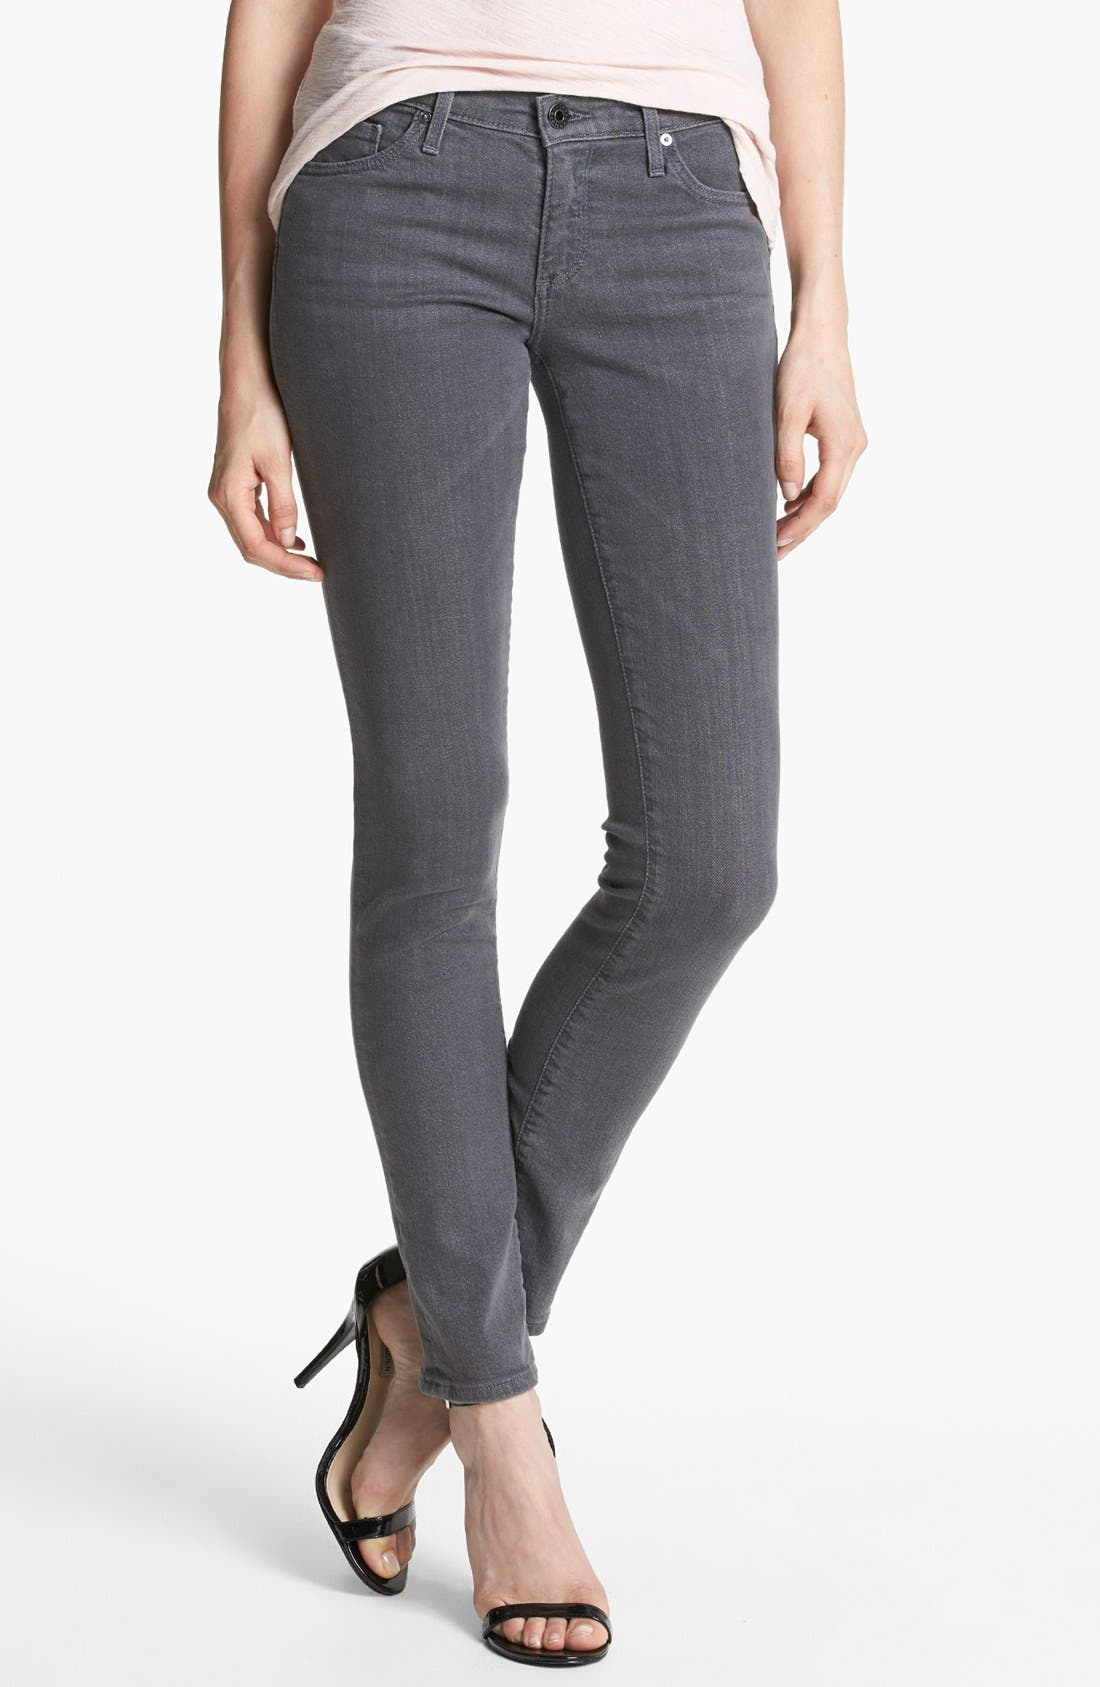 Alternate Image 1 Selected - AG Super Skinny Jeans (Stoneway)